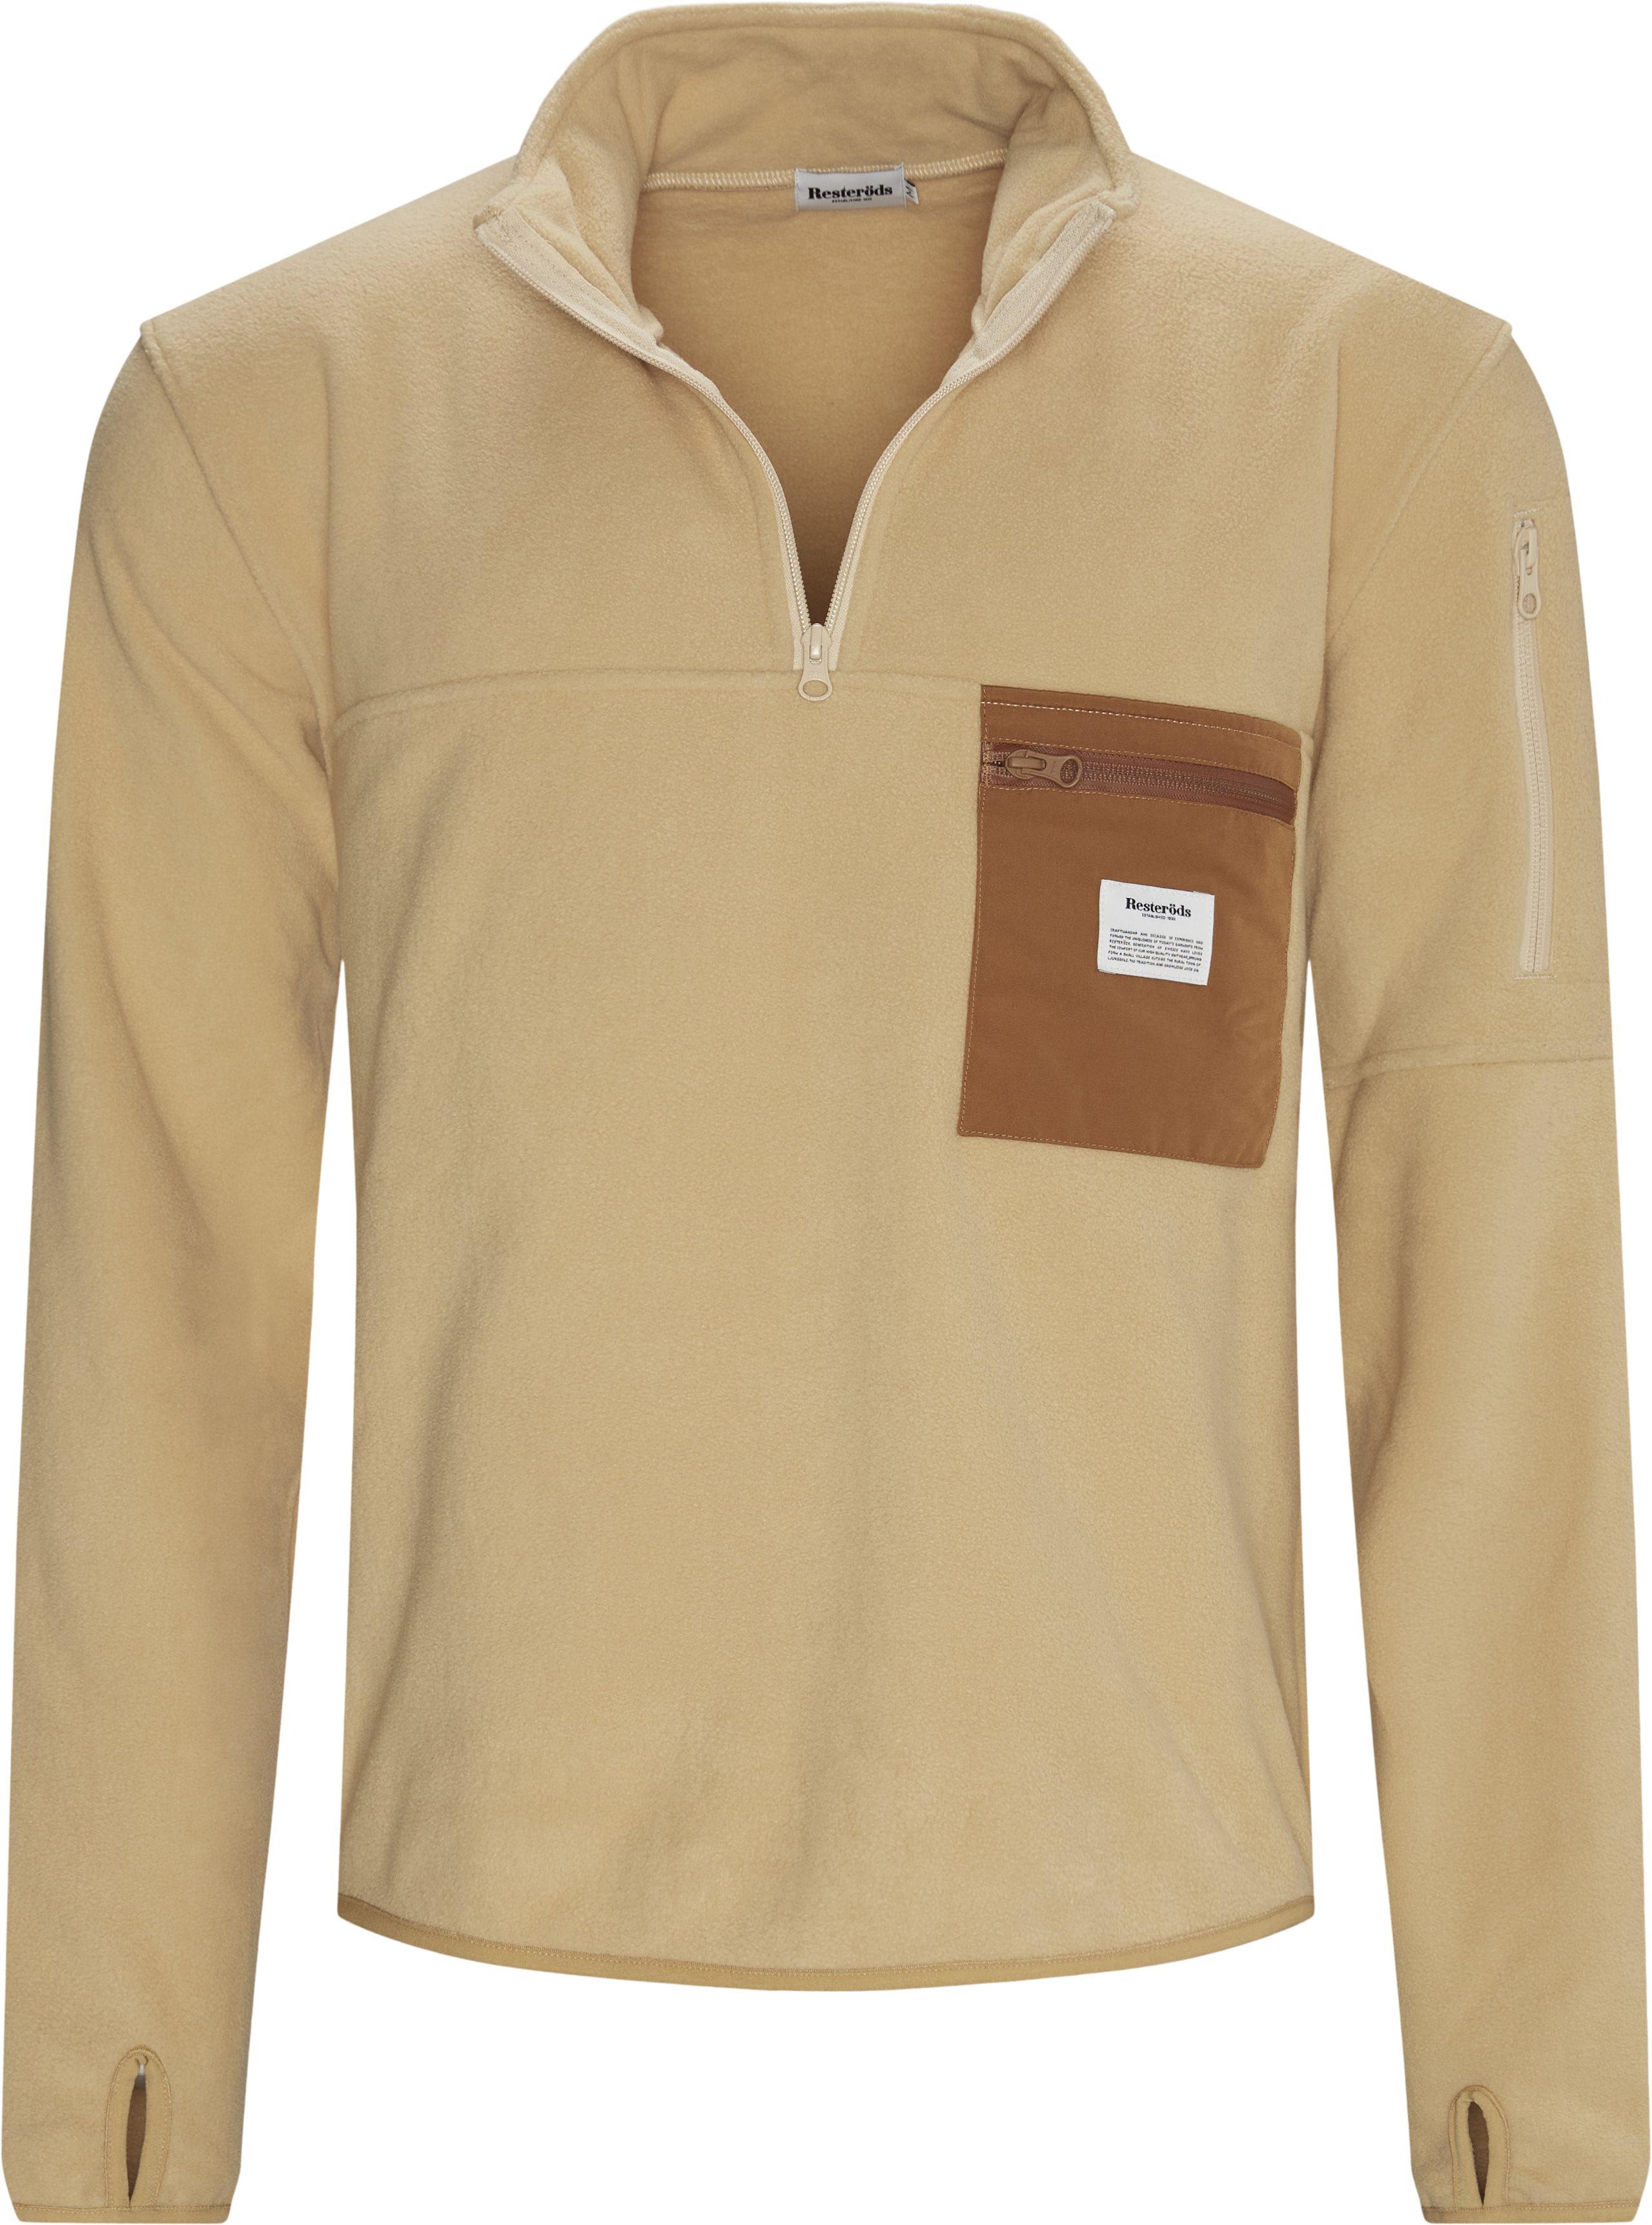 Pullover Fleece Anorak - Jackor - Regular - Sand